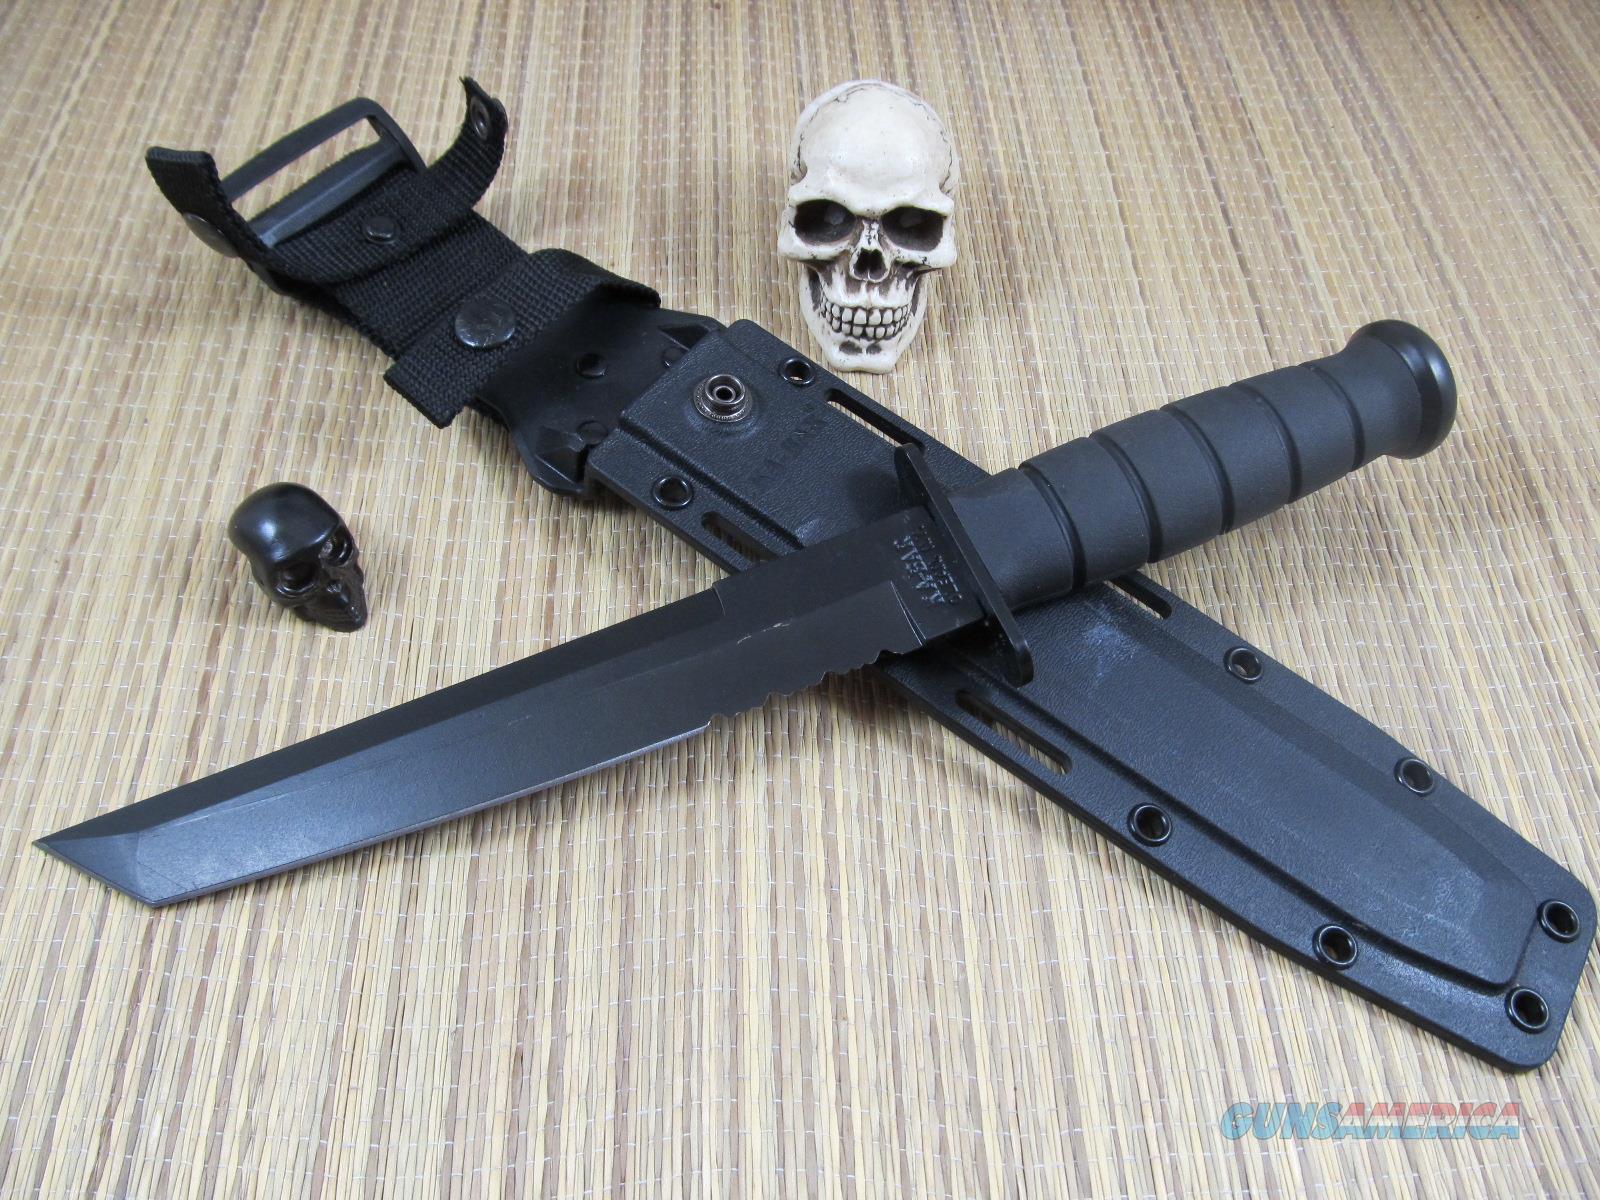 Ka Bar Tanto Knife Model 1245  Non-Guns > Knives/Swords > Knives > Fixed Blade > Hand Made